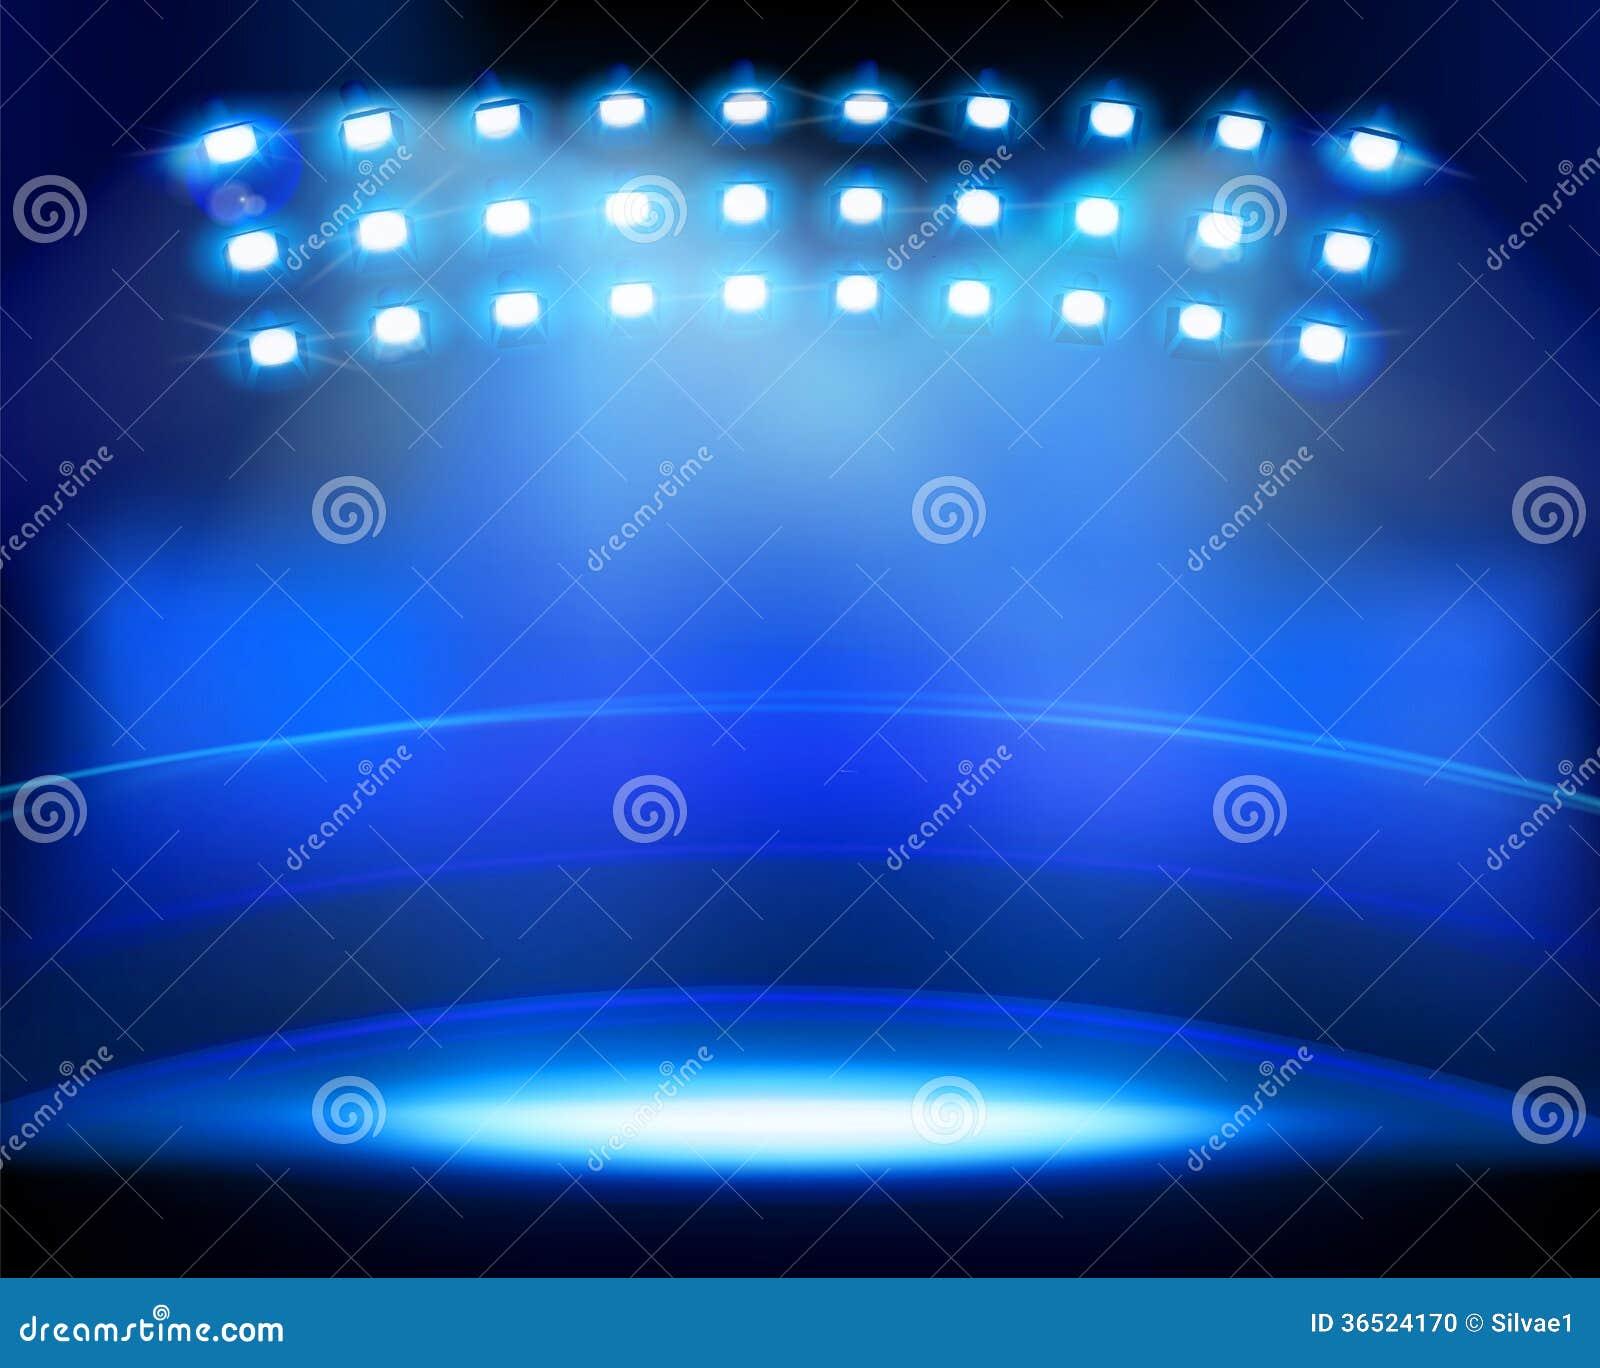 Stadium Lights Svg: Stadium Spotlights. Vector Illustration. Stock Photo